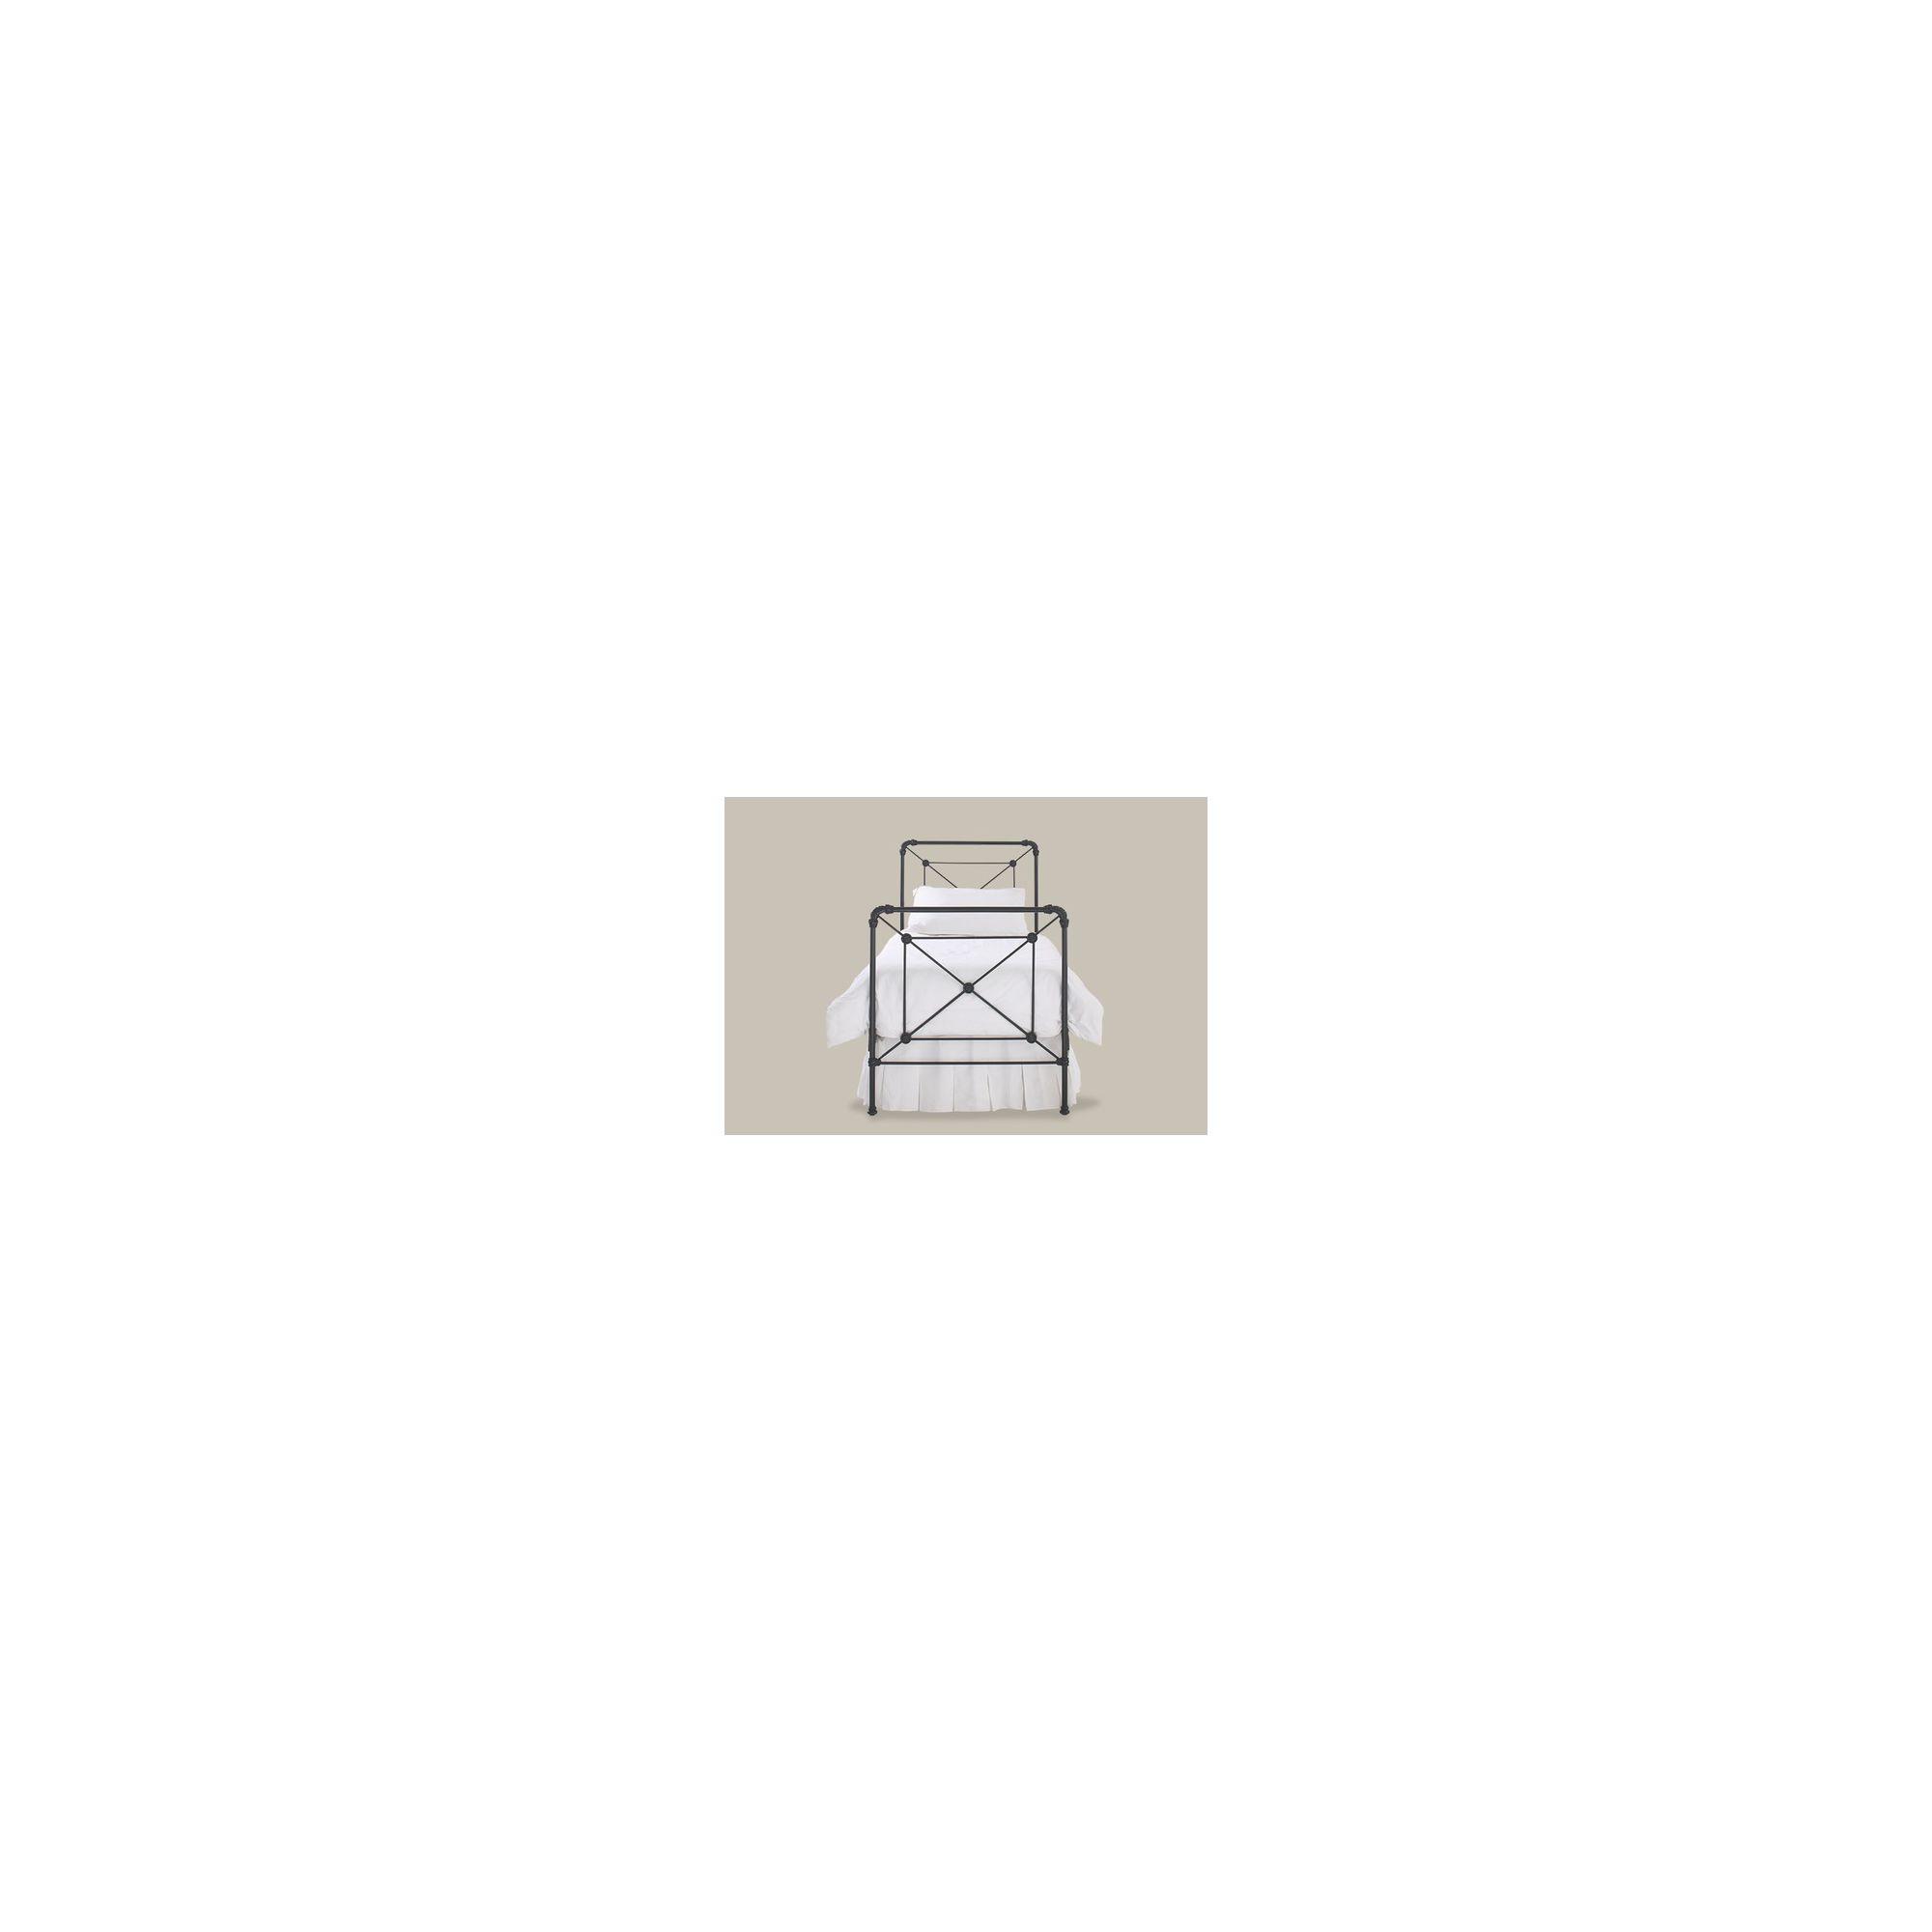 OBC Calais Bed Frame - Single - Satin Black at Tesco Direct